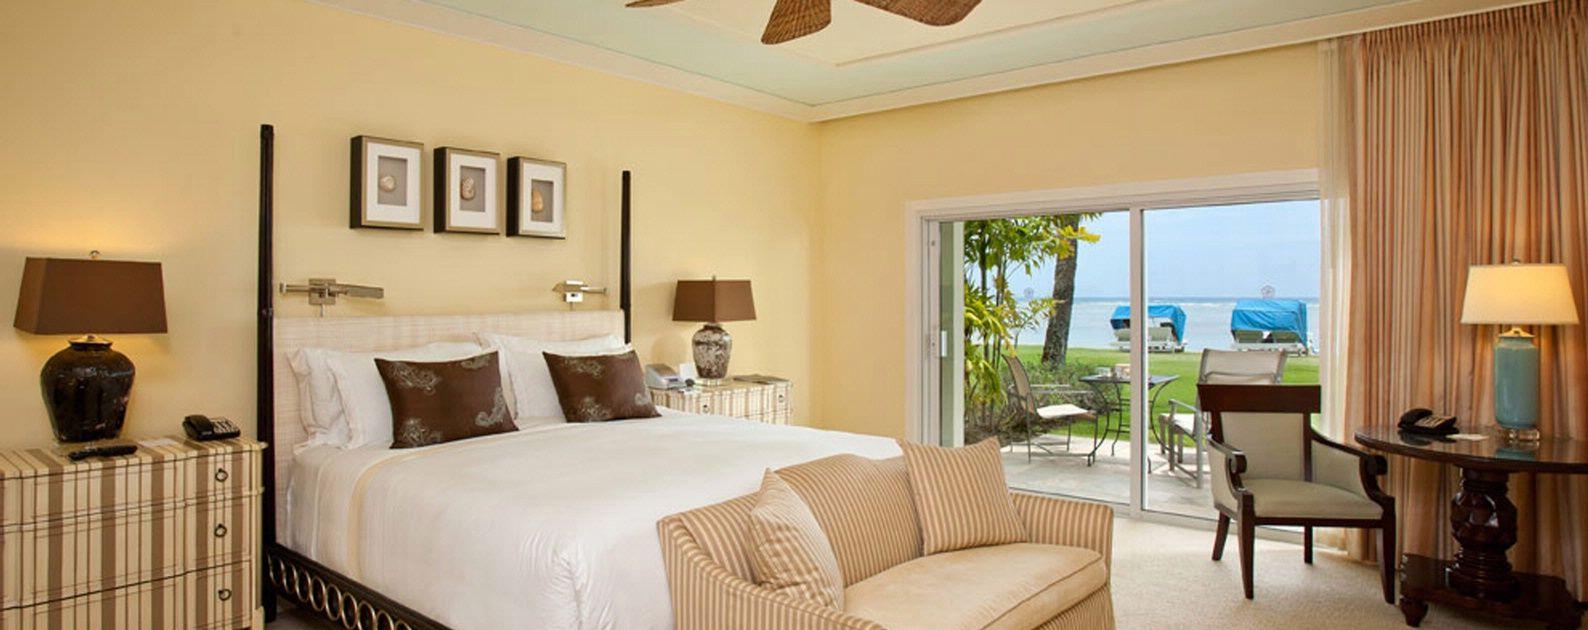 Honolulu Hotel Beach Front Lanai Room Kahala Resort With Images